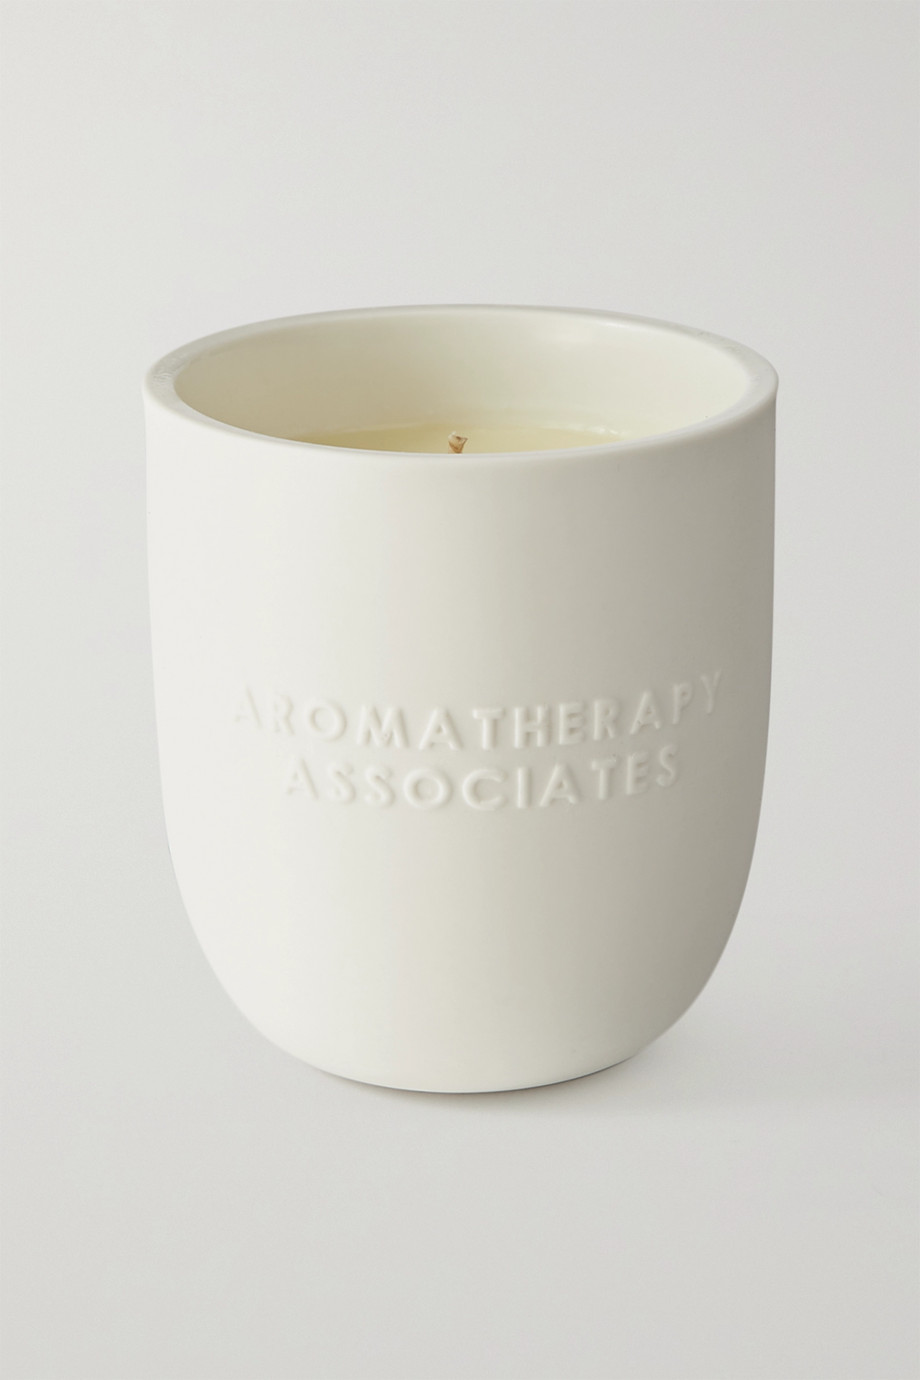 Aromatherapy Associates De-Stress Candle, 200g